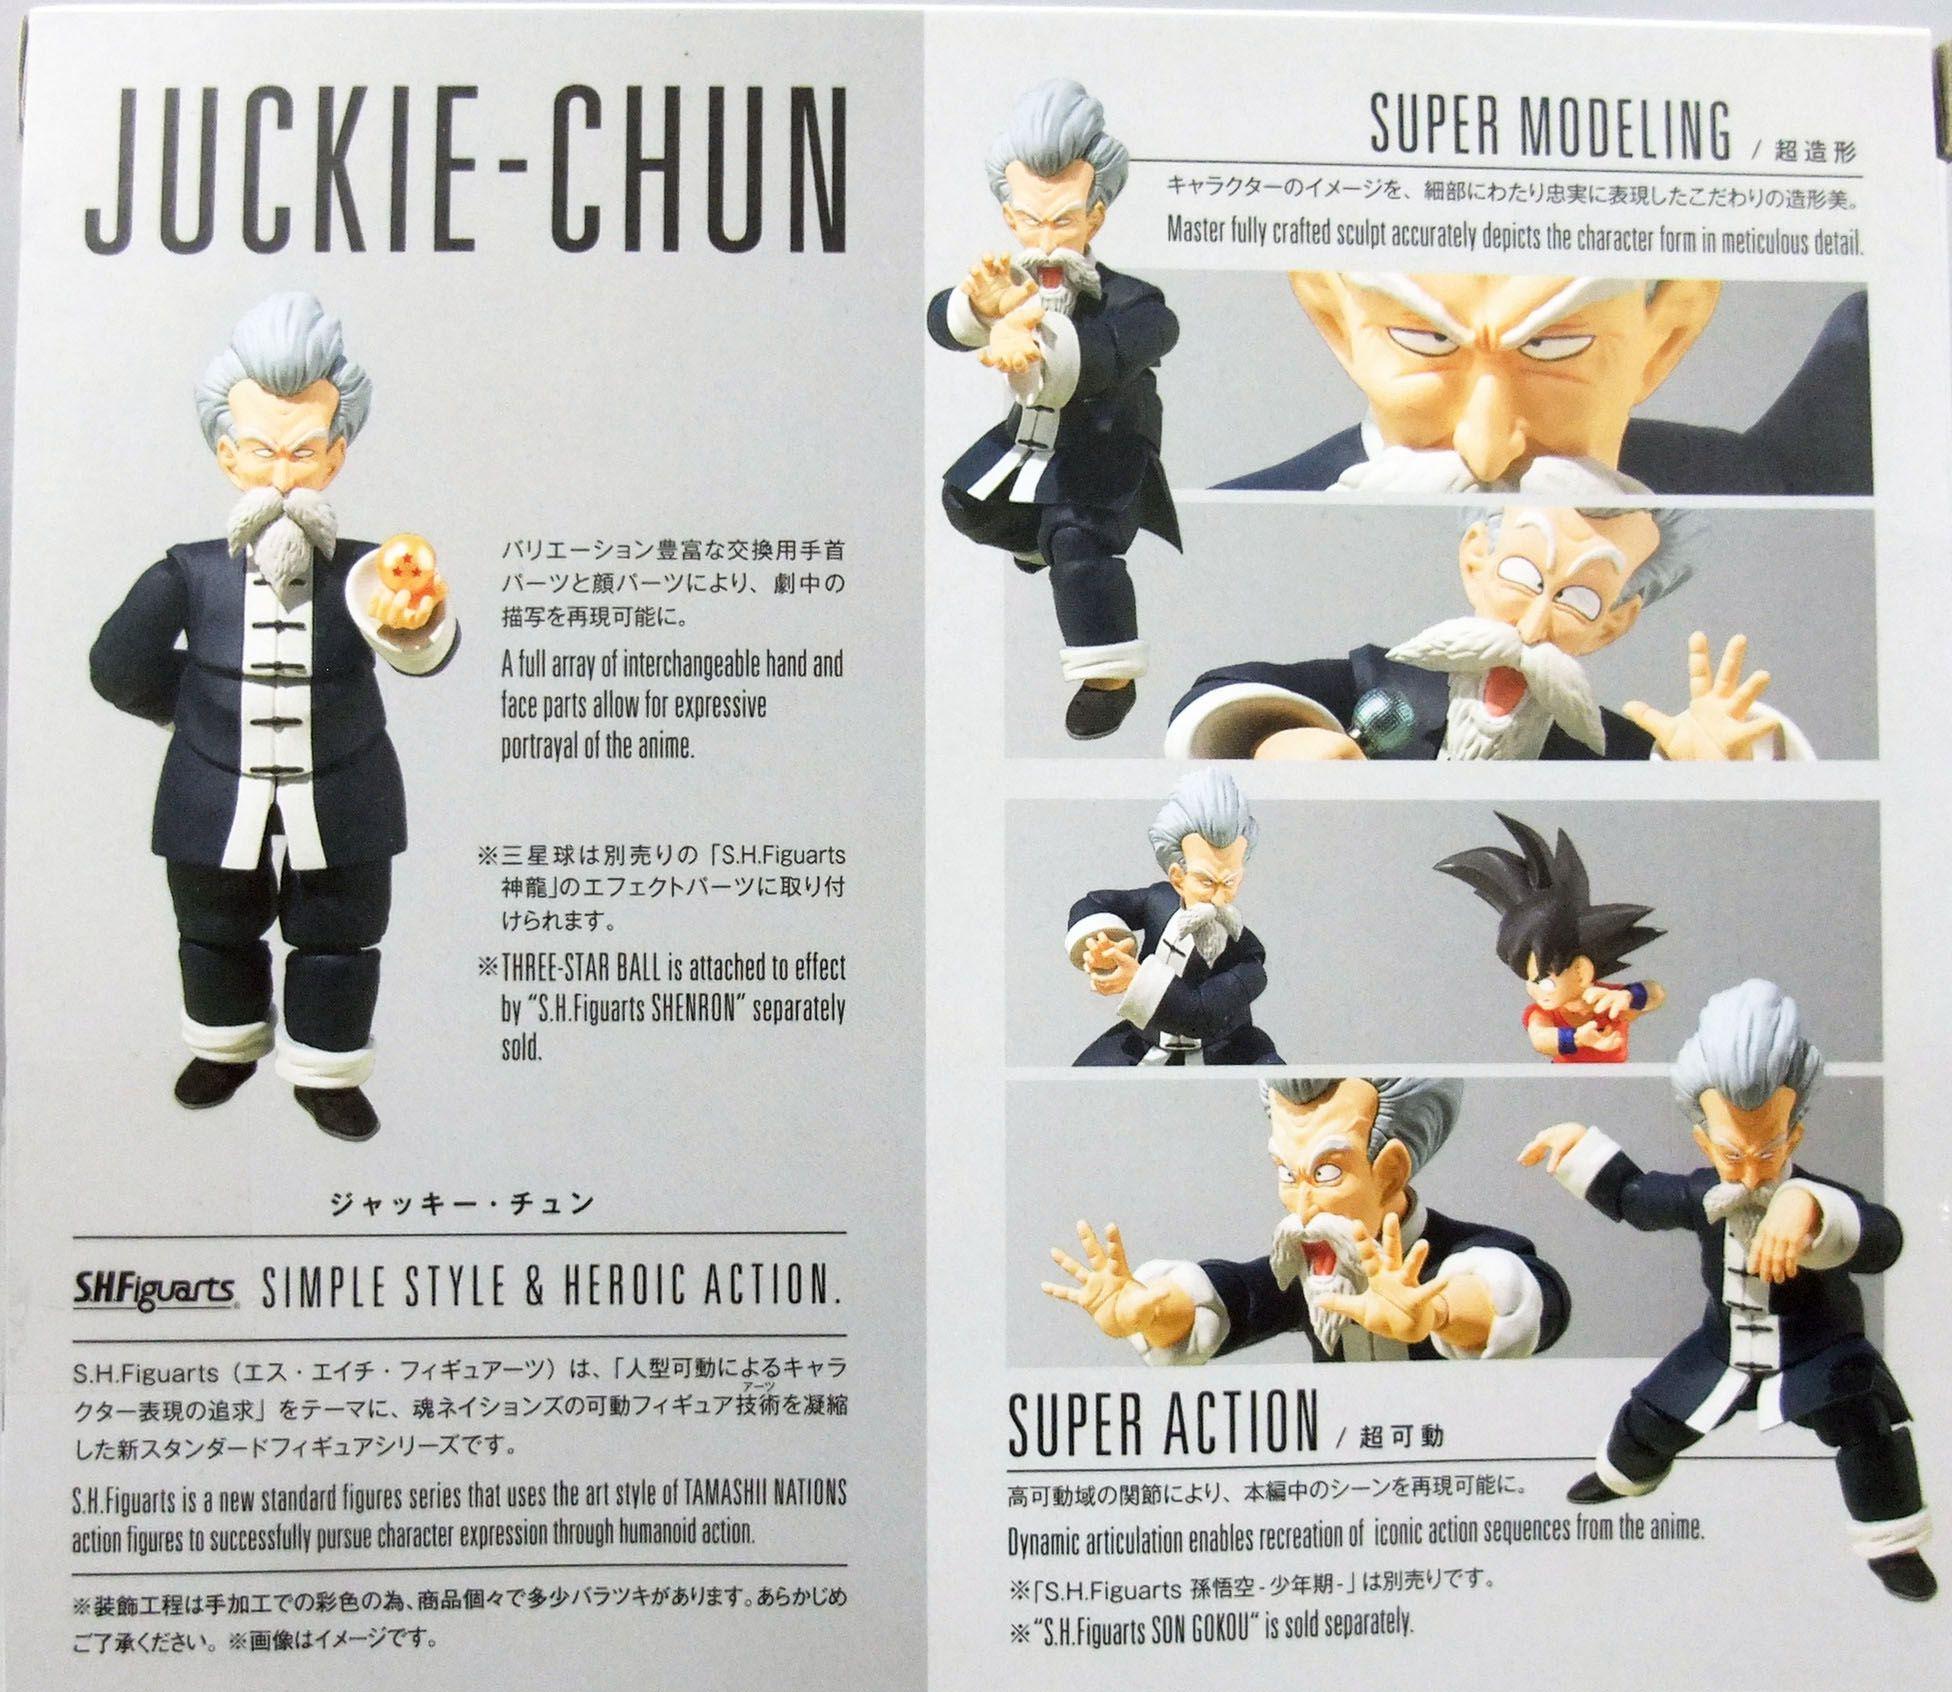 Dragonball Z - Bandai S.H.Figuarts - Jackie Chun